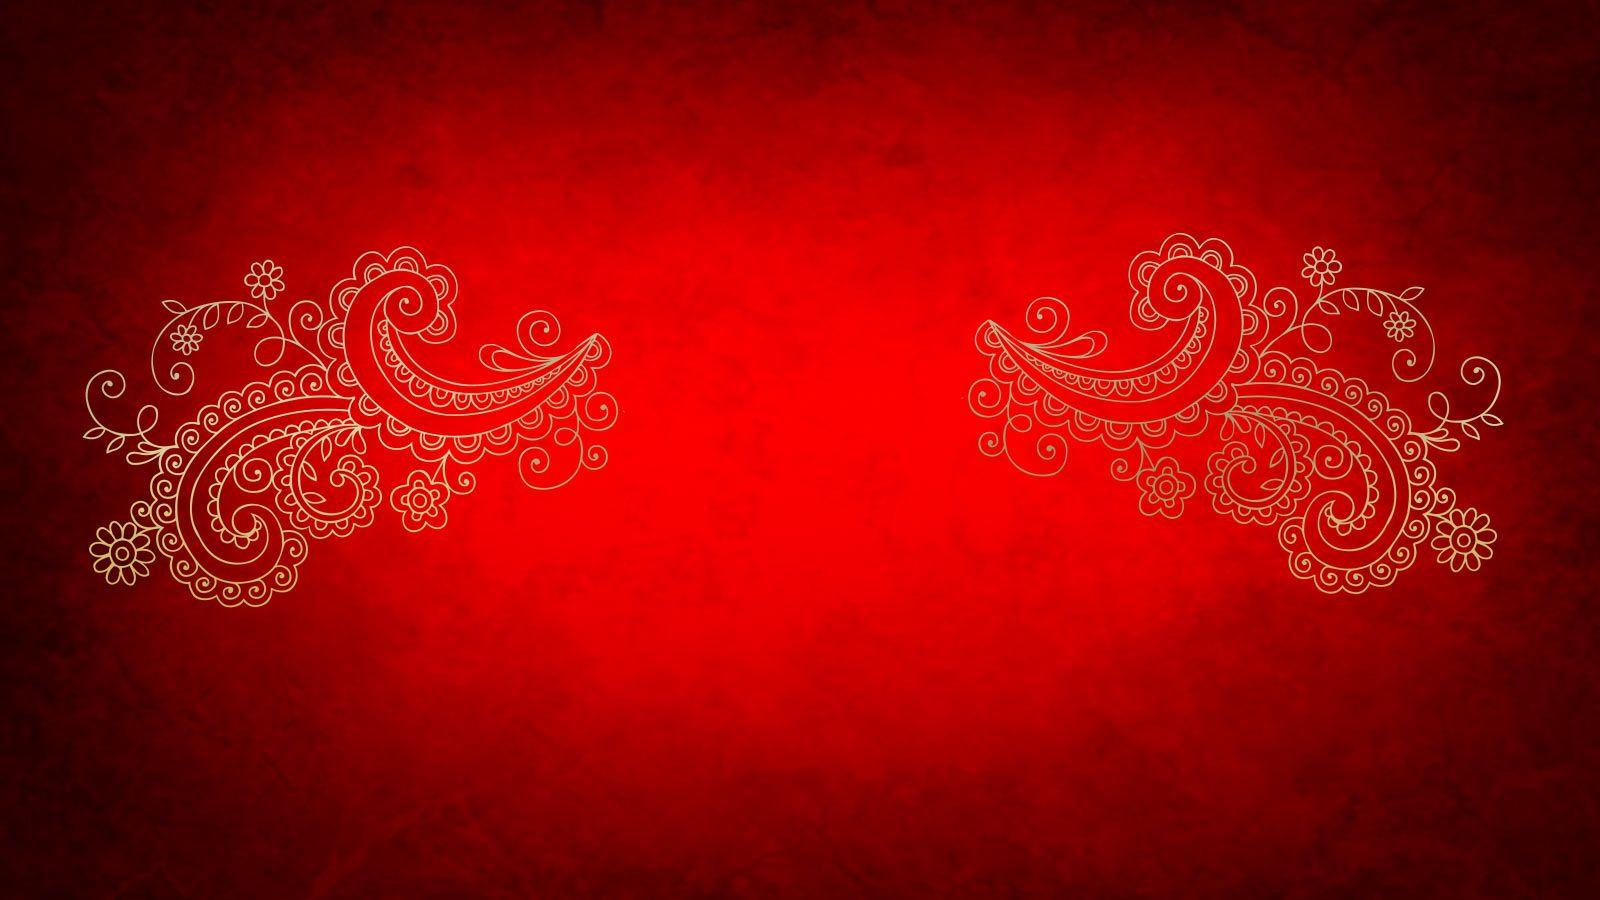 Indian Wedding Background Hd Wallpaper Impremedianet Wedding Card Design Indian Wedding Background Background Hd Wallpaper